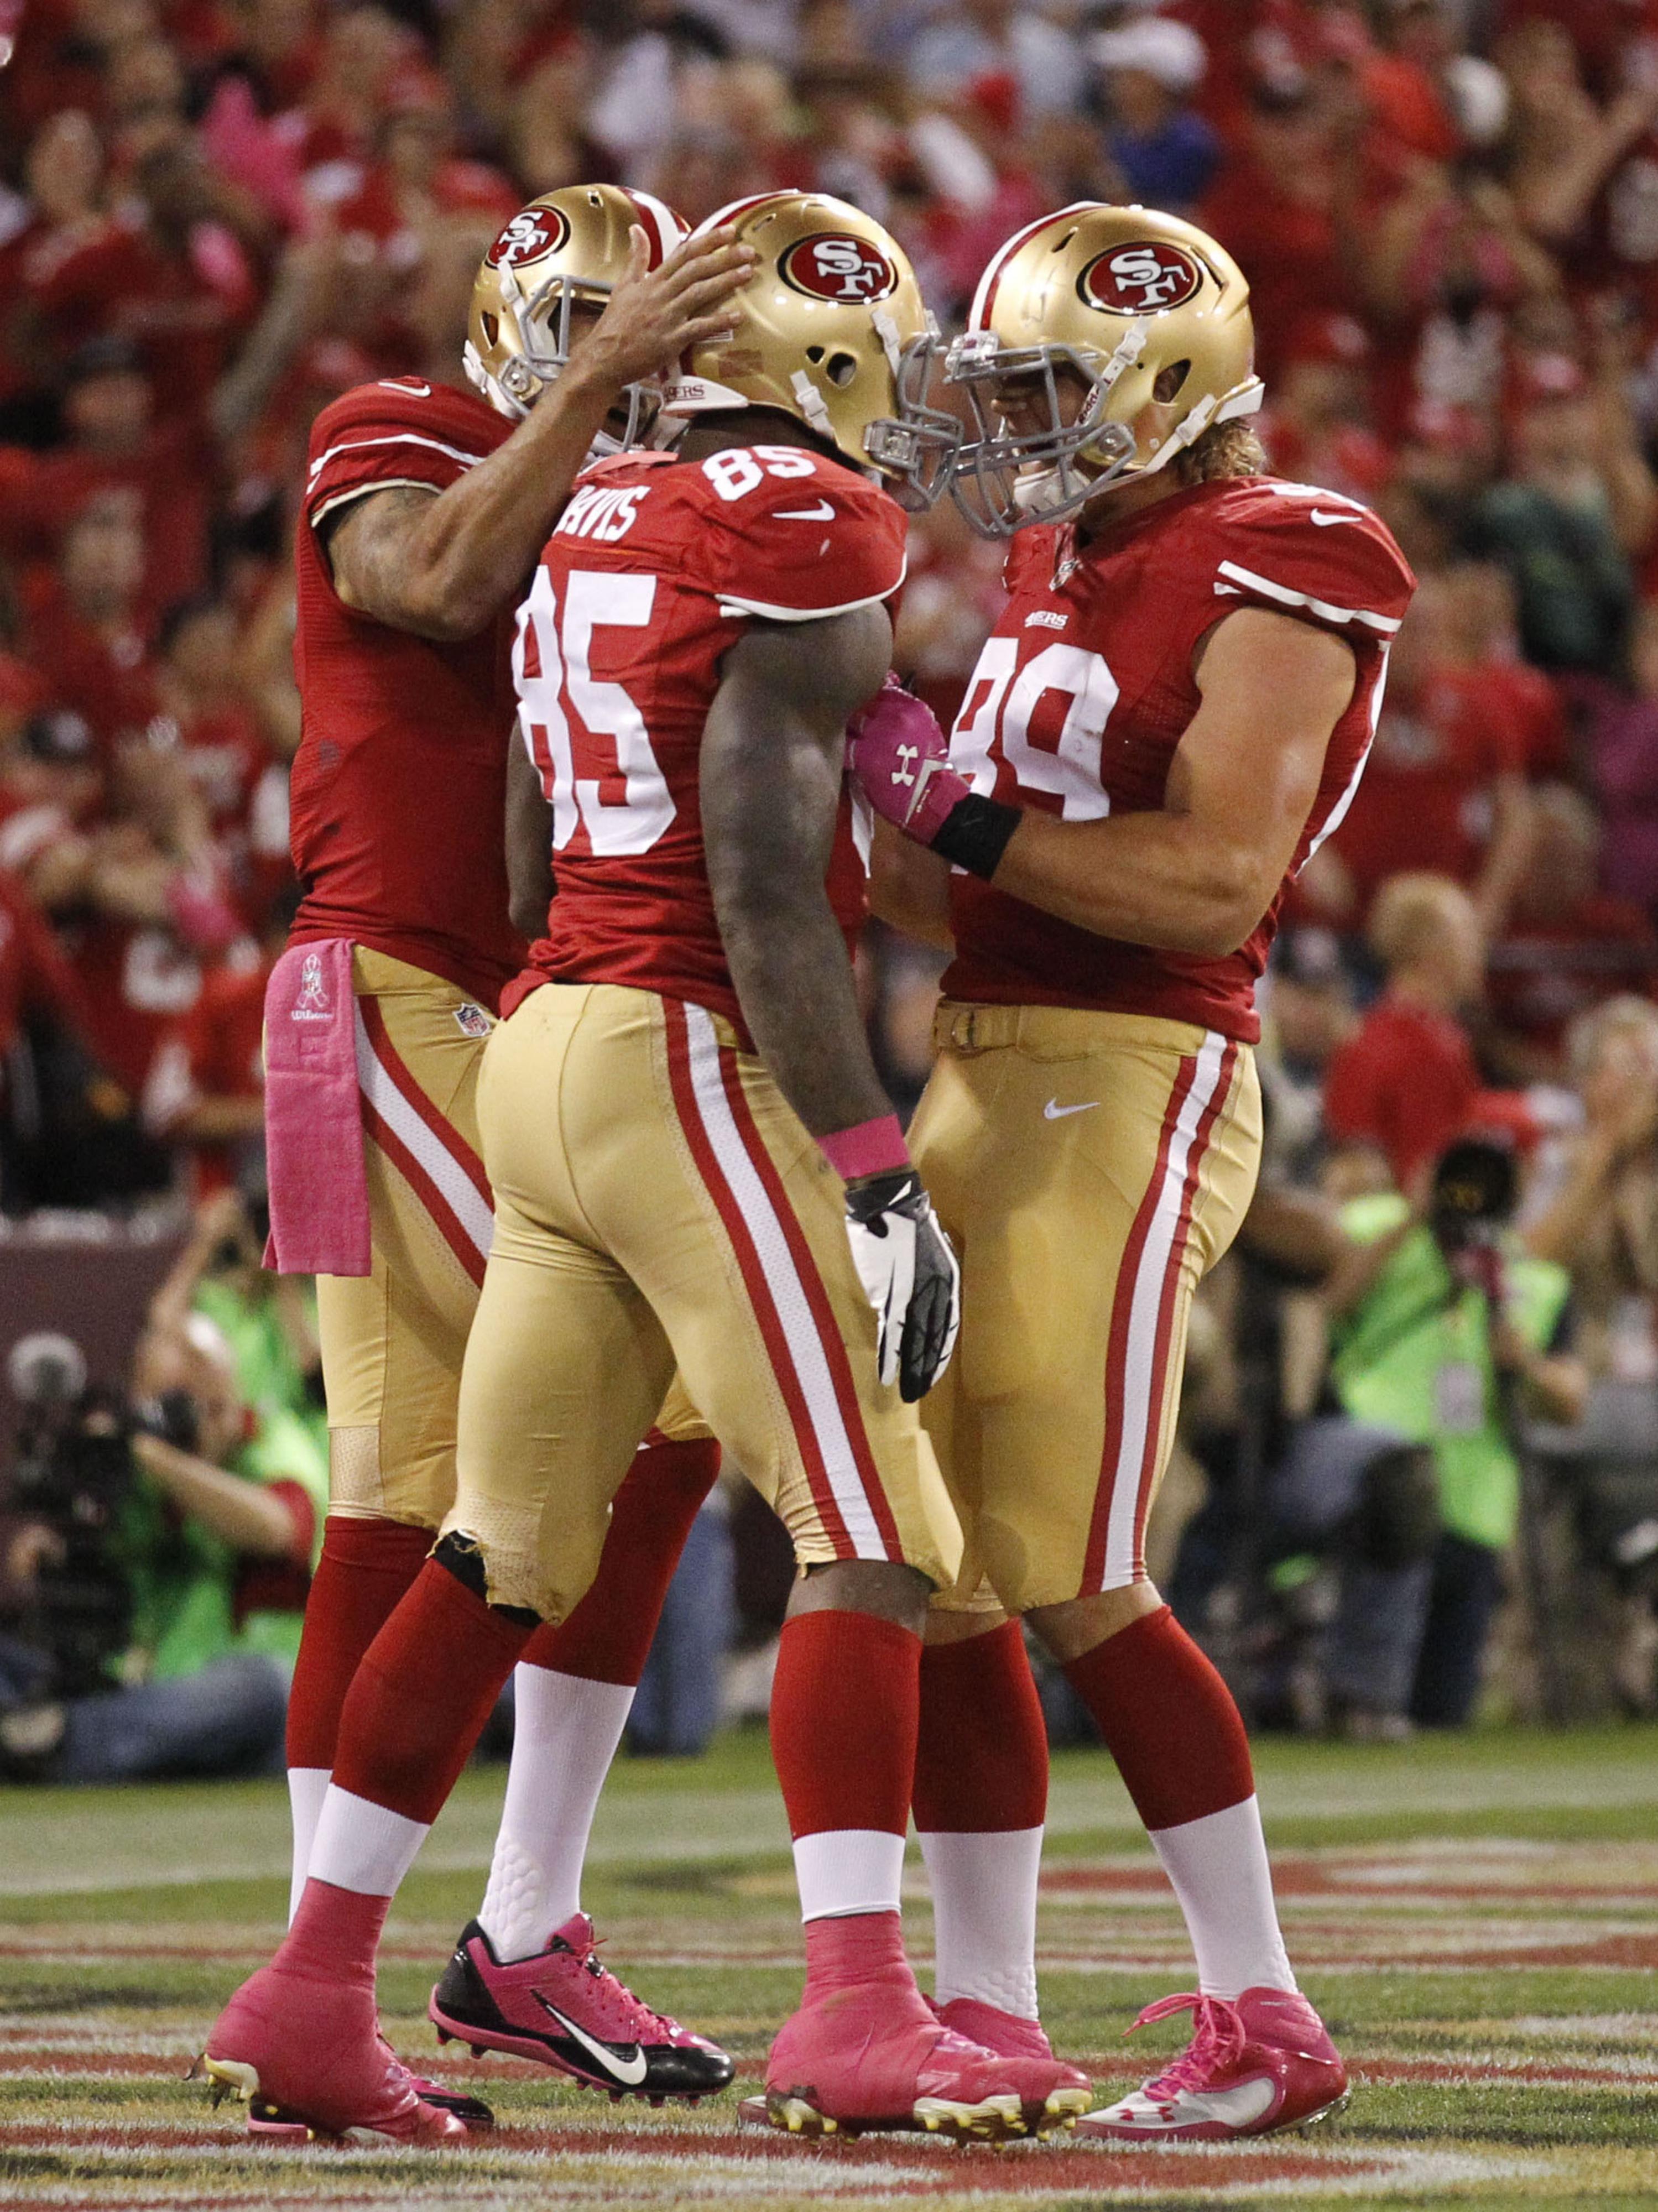 Texans vs. 49ers 2013: Tramaine Brock breaks out for San Fran